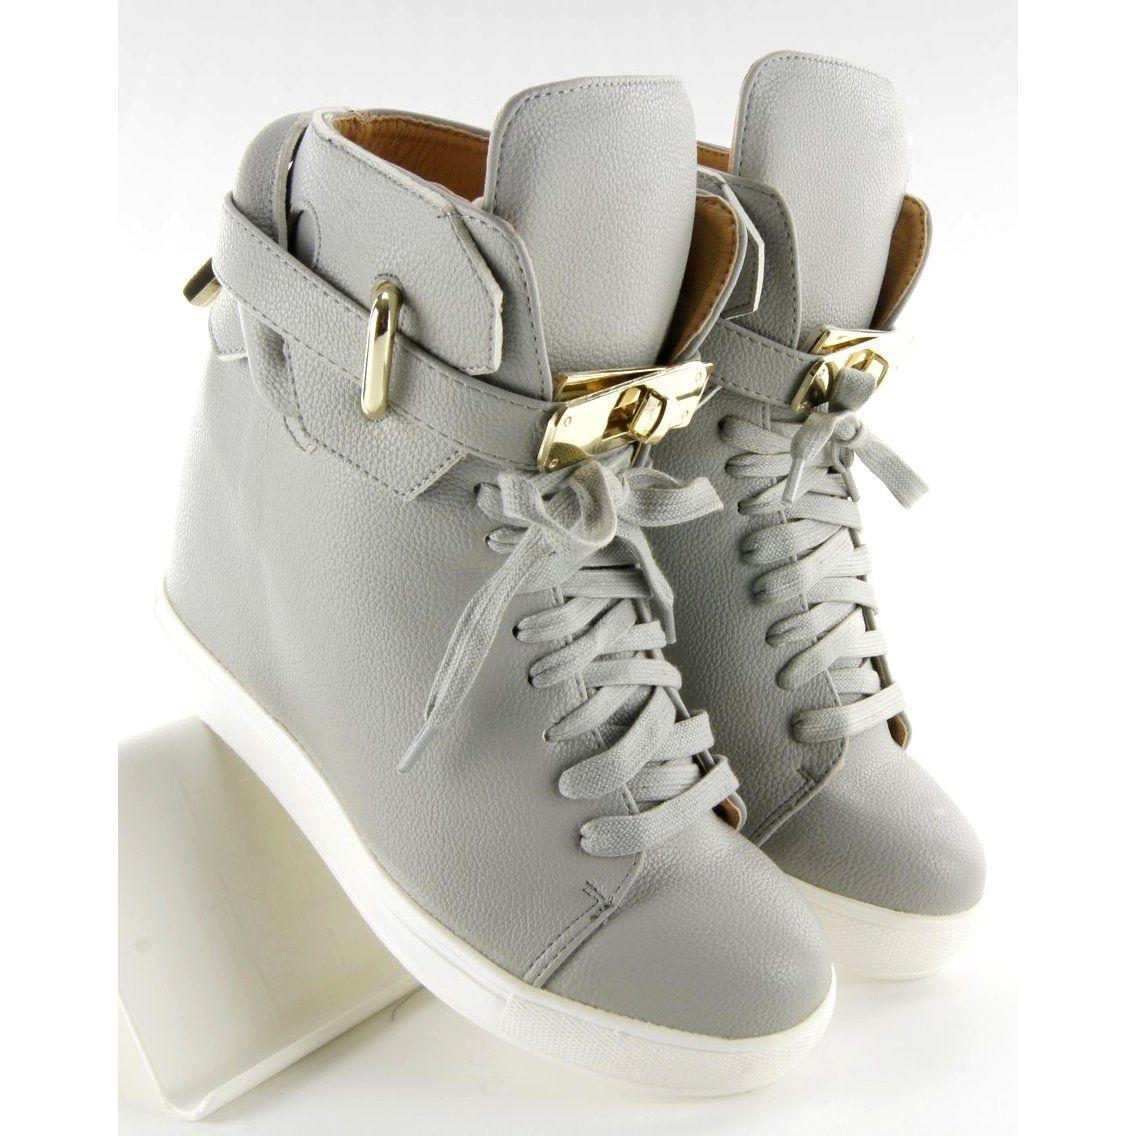 Sportowe Damskie Obuwiedamskie Szare Sneakersy Z Klodka 6059 Grey Ii Gat Obuwie Damskie Wedge Sneaker Shoes Sneakers